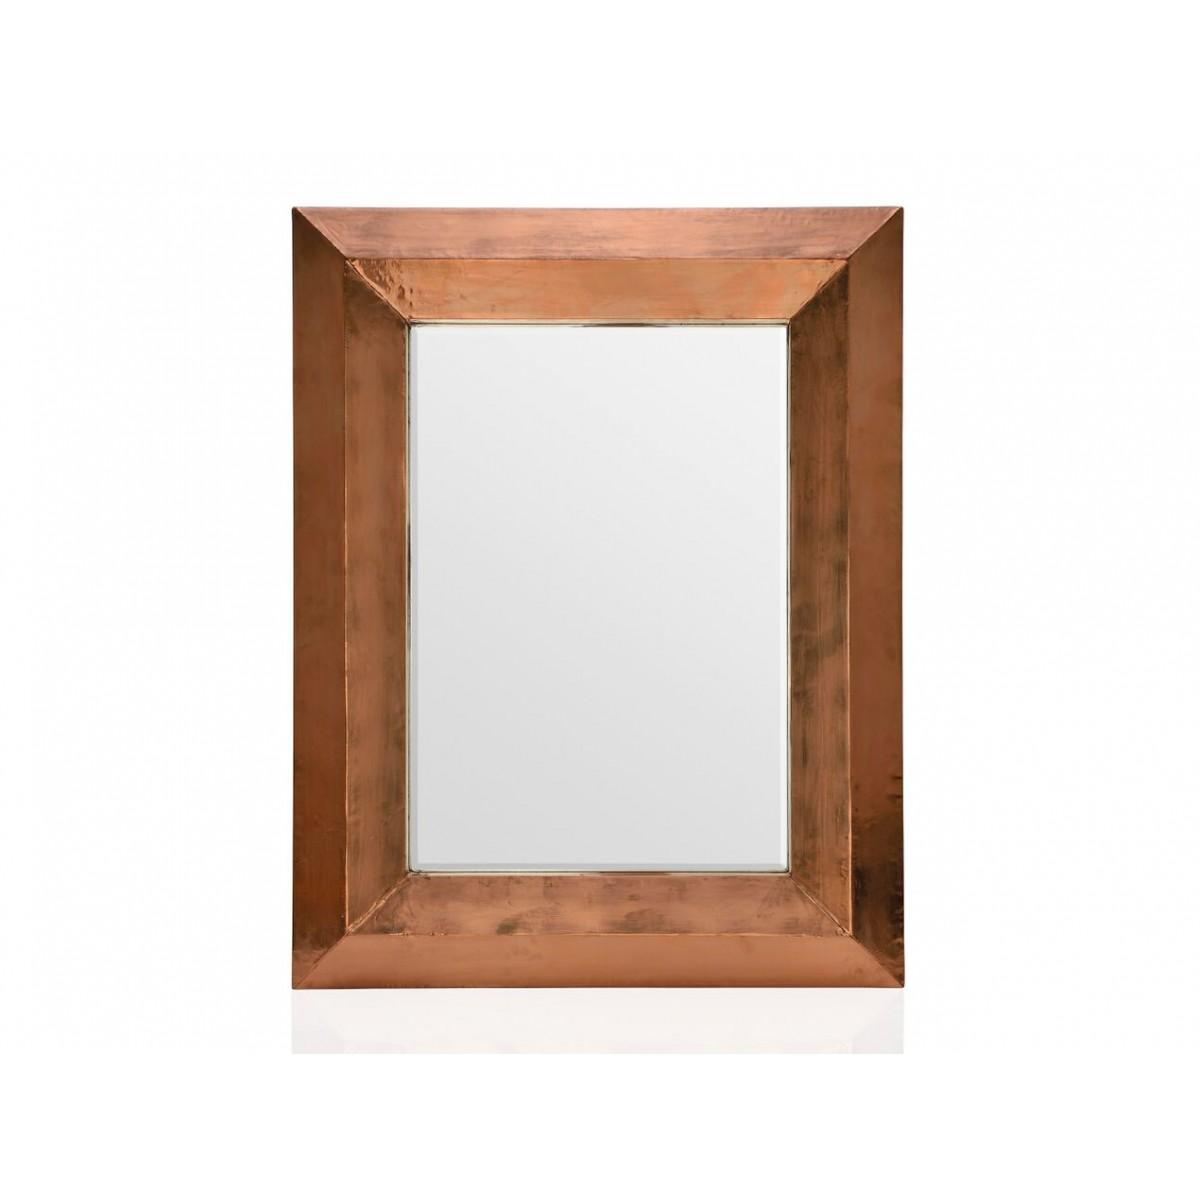 Inwood miroir mural rectangulaire en cuivre 70 x 90 cm for Miroir 70 cm